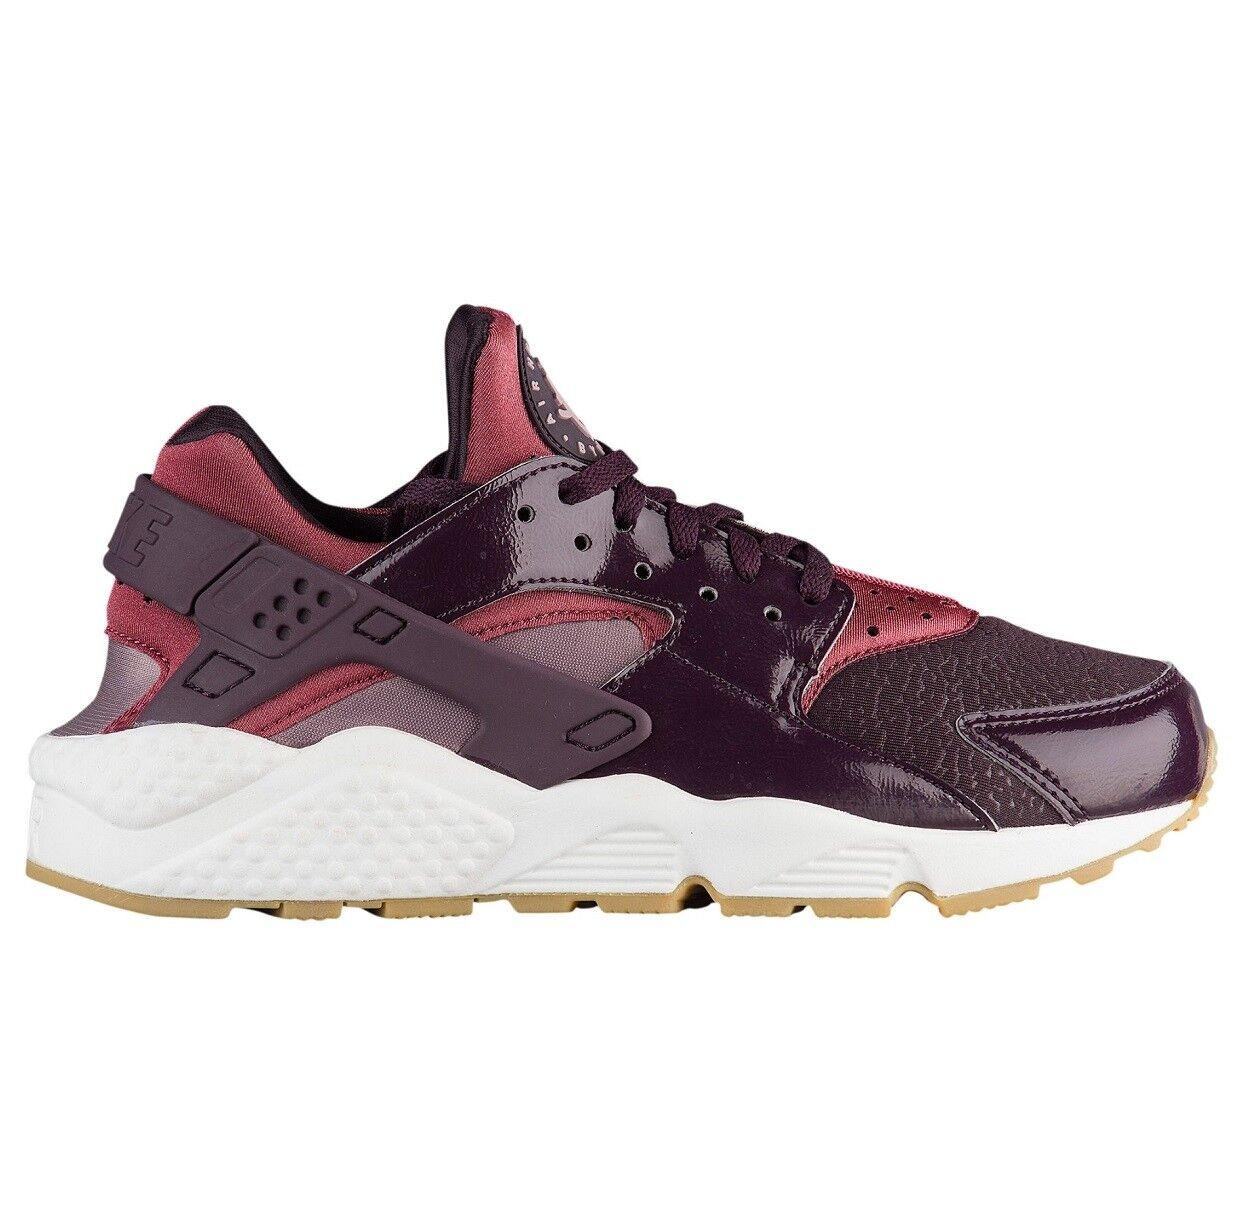 Nike Air Huarache Huarache Huarache Run Womens 634835-609 Port Wine Taupe Running shoes Size 7.5 9fdf4a